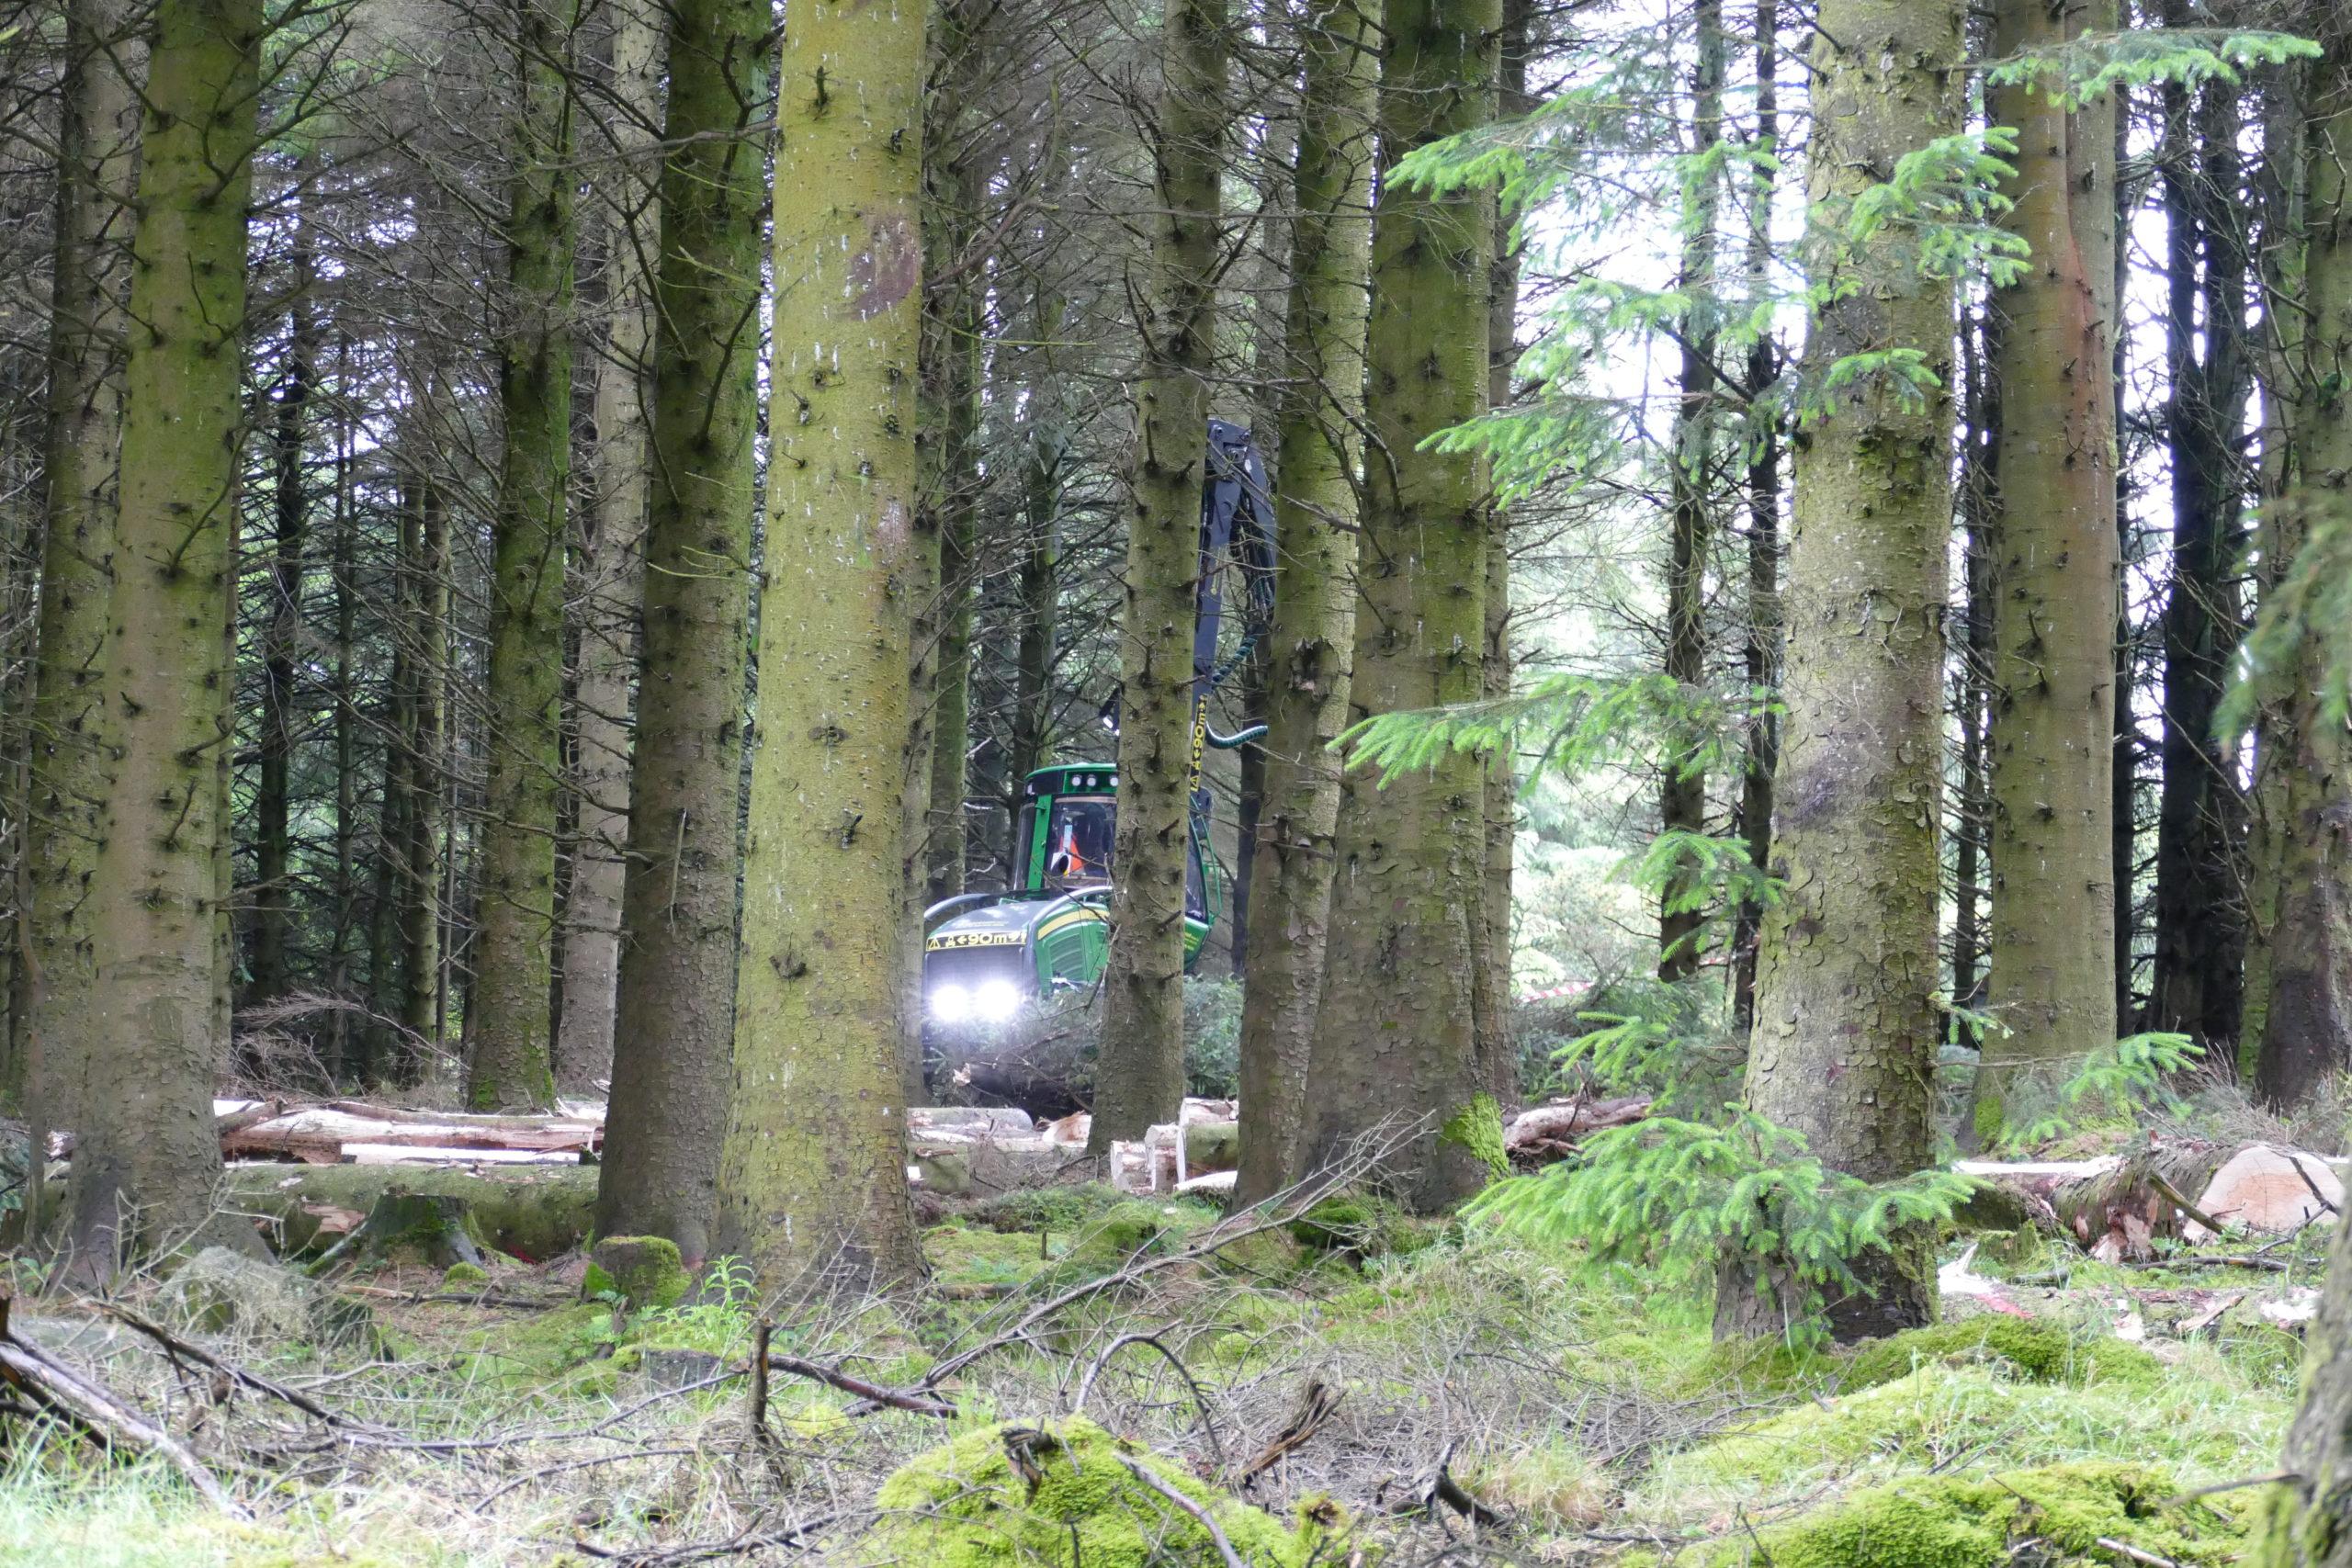 CCF thinning in operation in Ballyedmonduff